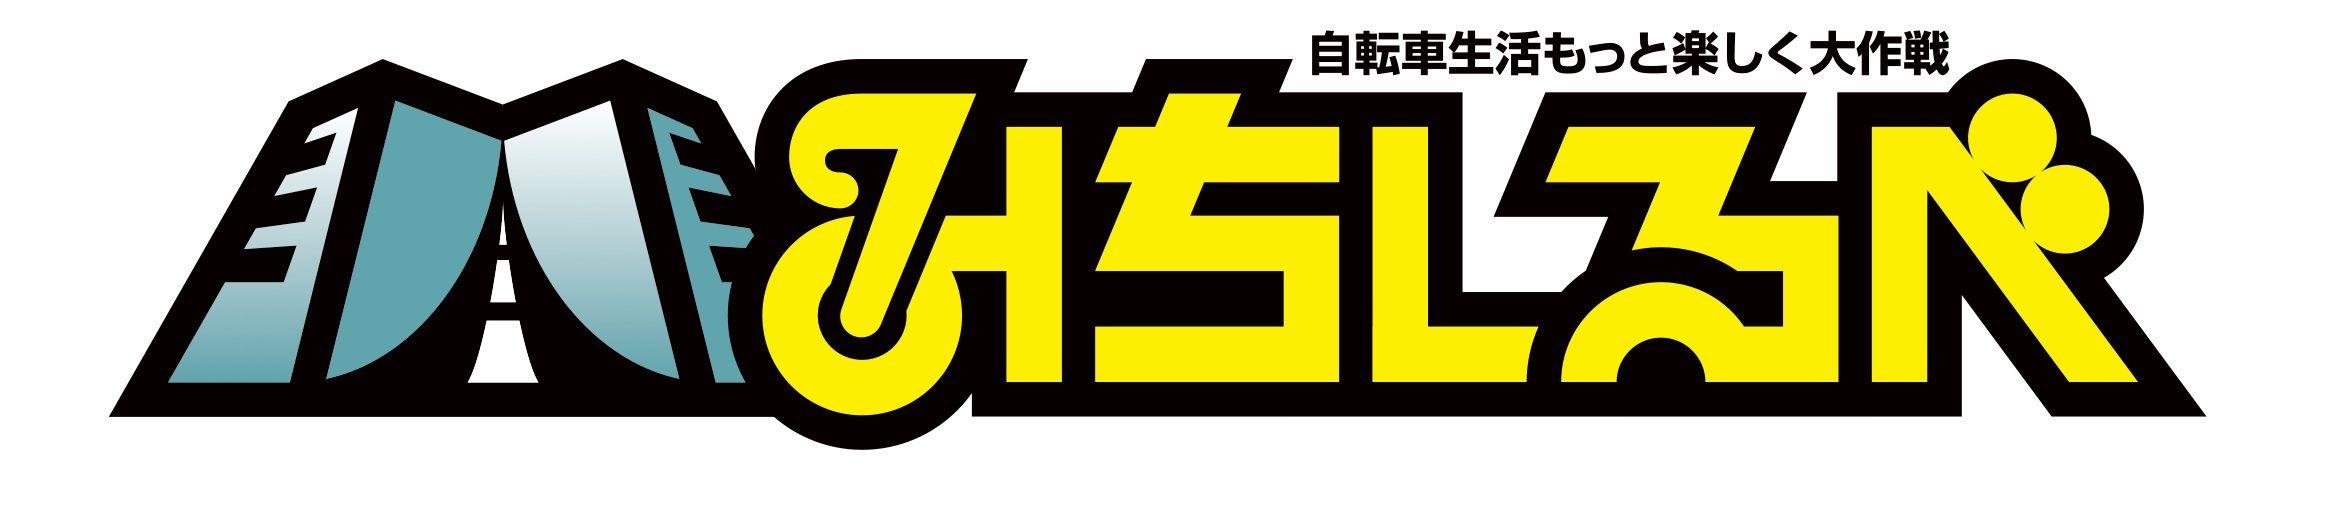 michishirube_logo_icon_4c